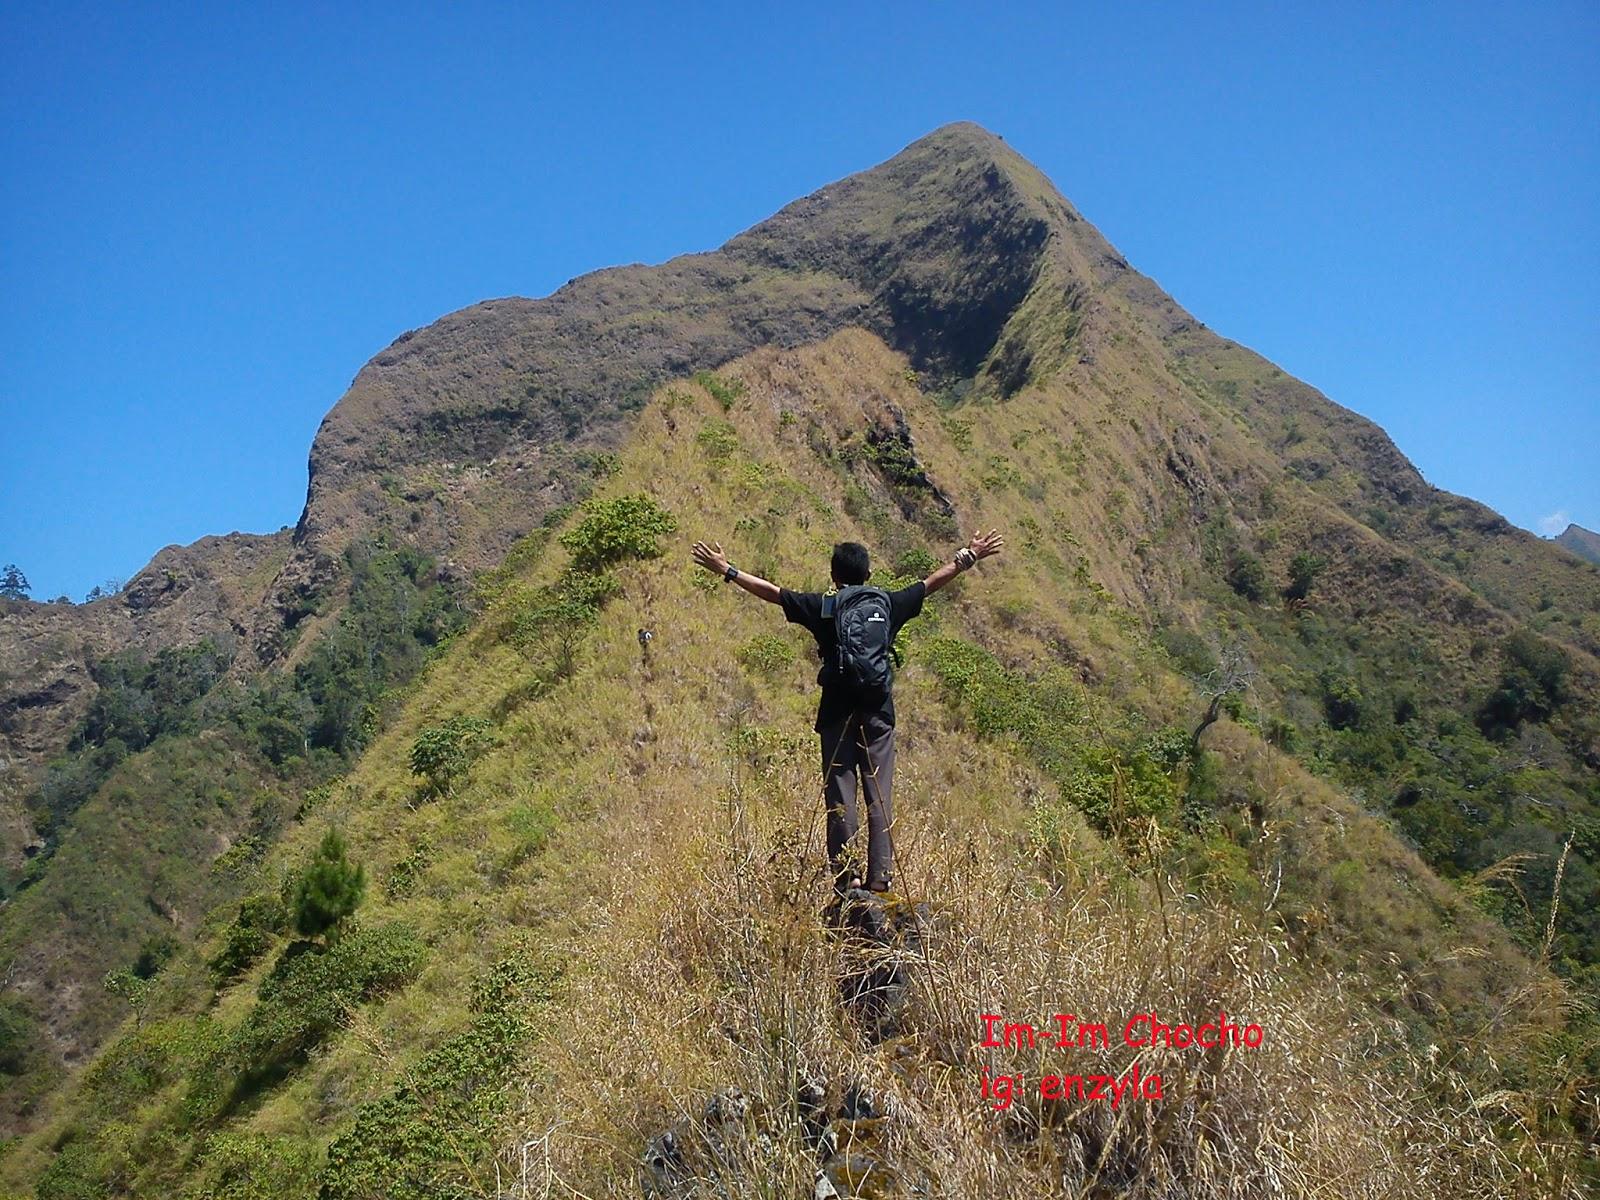 Relawan Muda Bondowoso Sensasi Ke Puncak Piramid